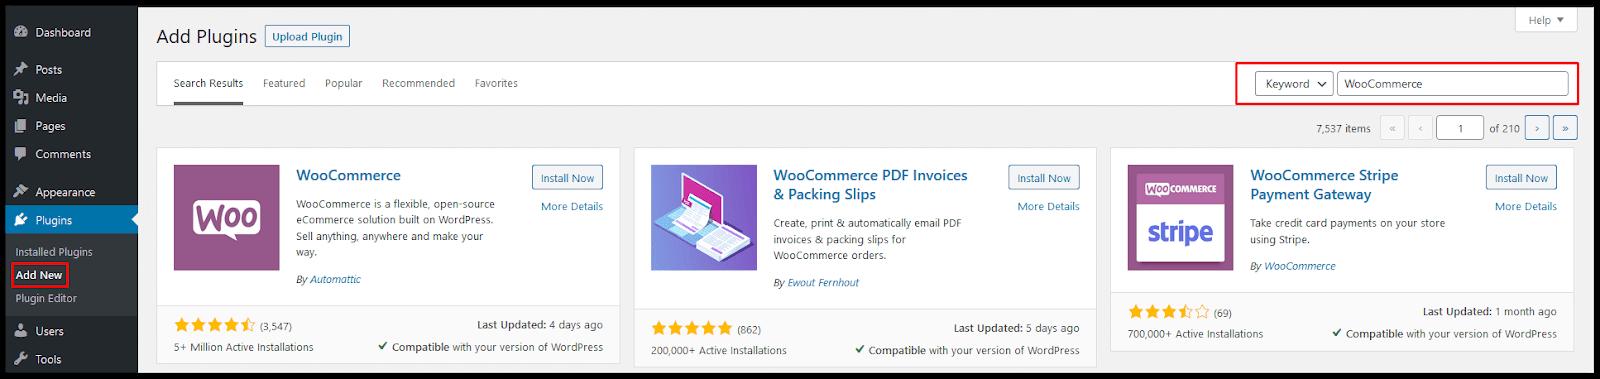 Menambahkan plugin WooCommerce di WordPress.